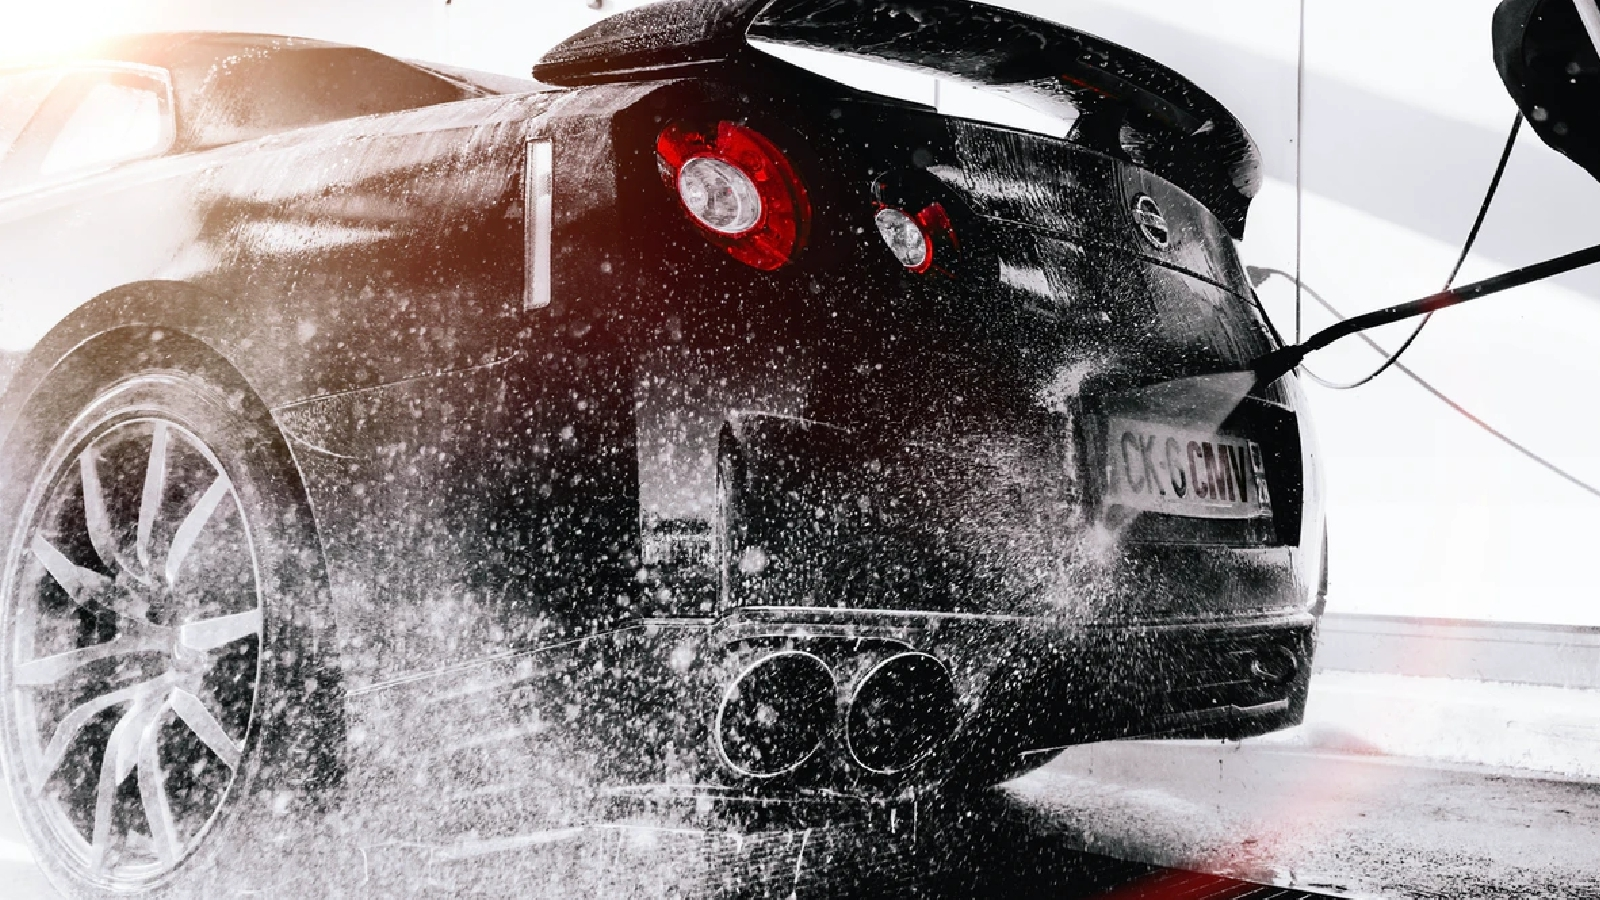 The-Wesley-Car-Wash